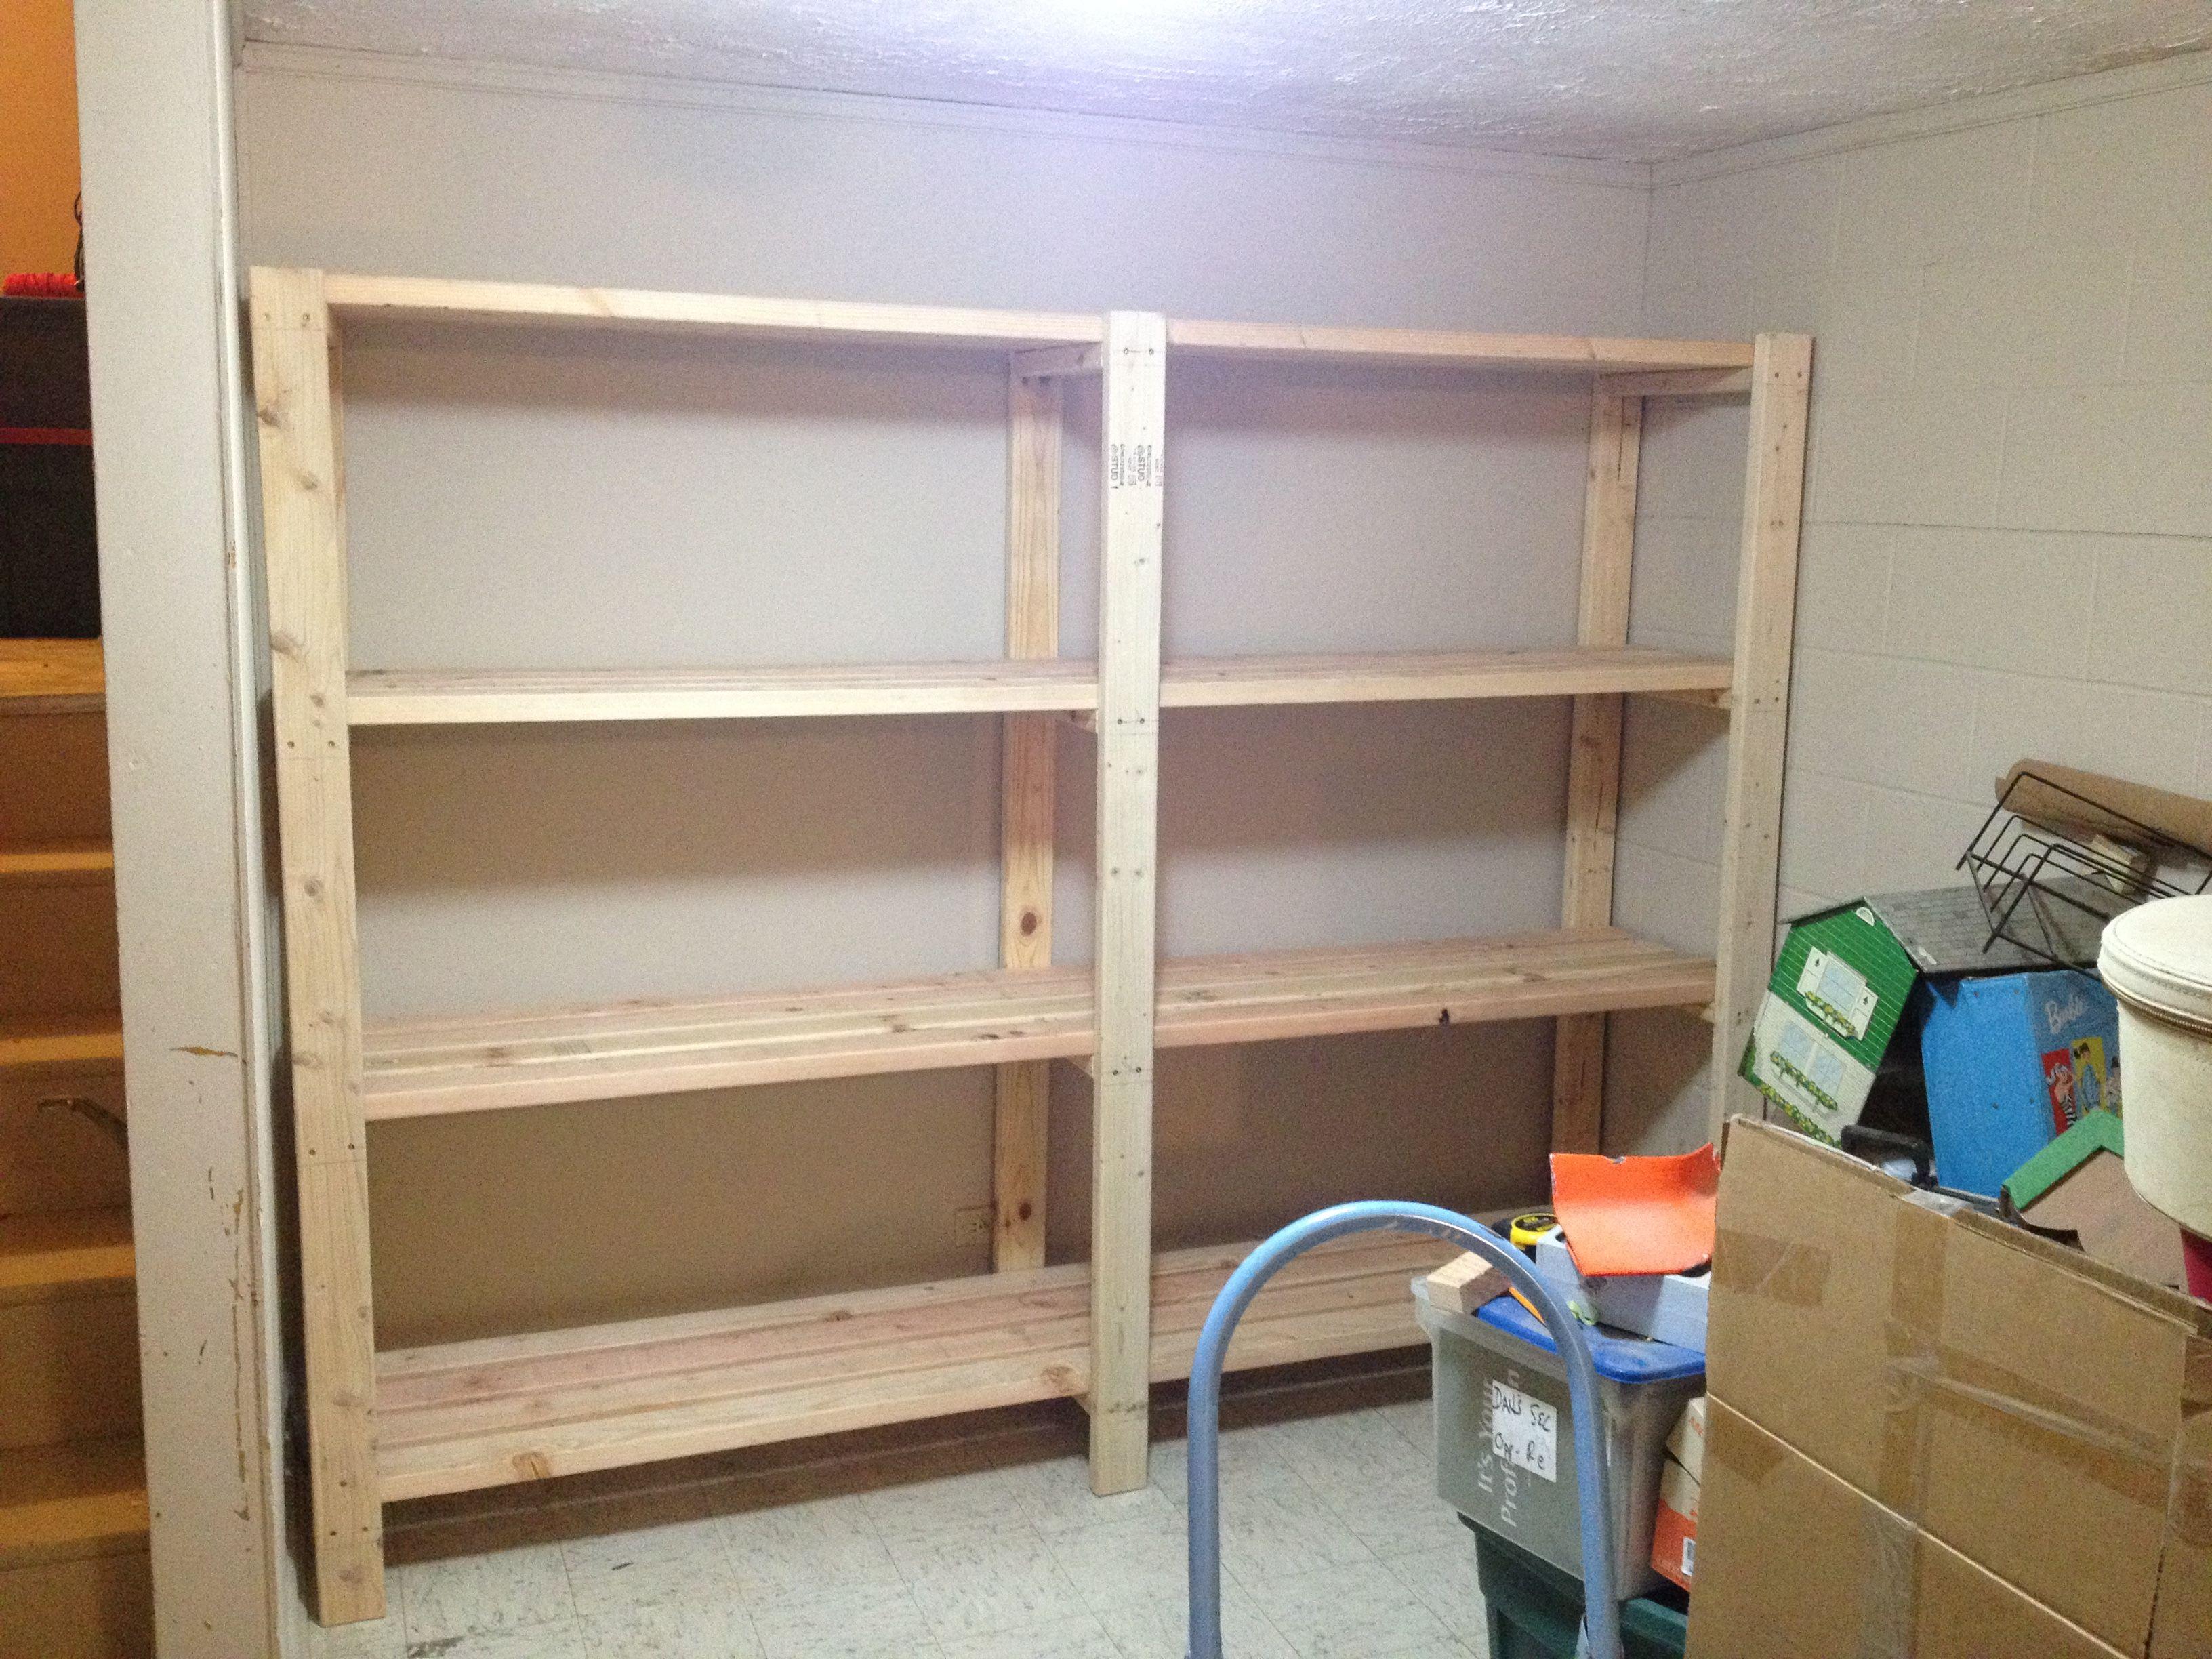 2 x 4 Garage Shelves Built into Basement Storage! Do It